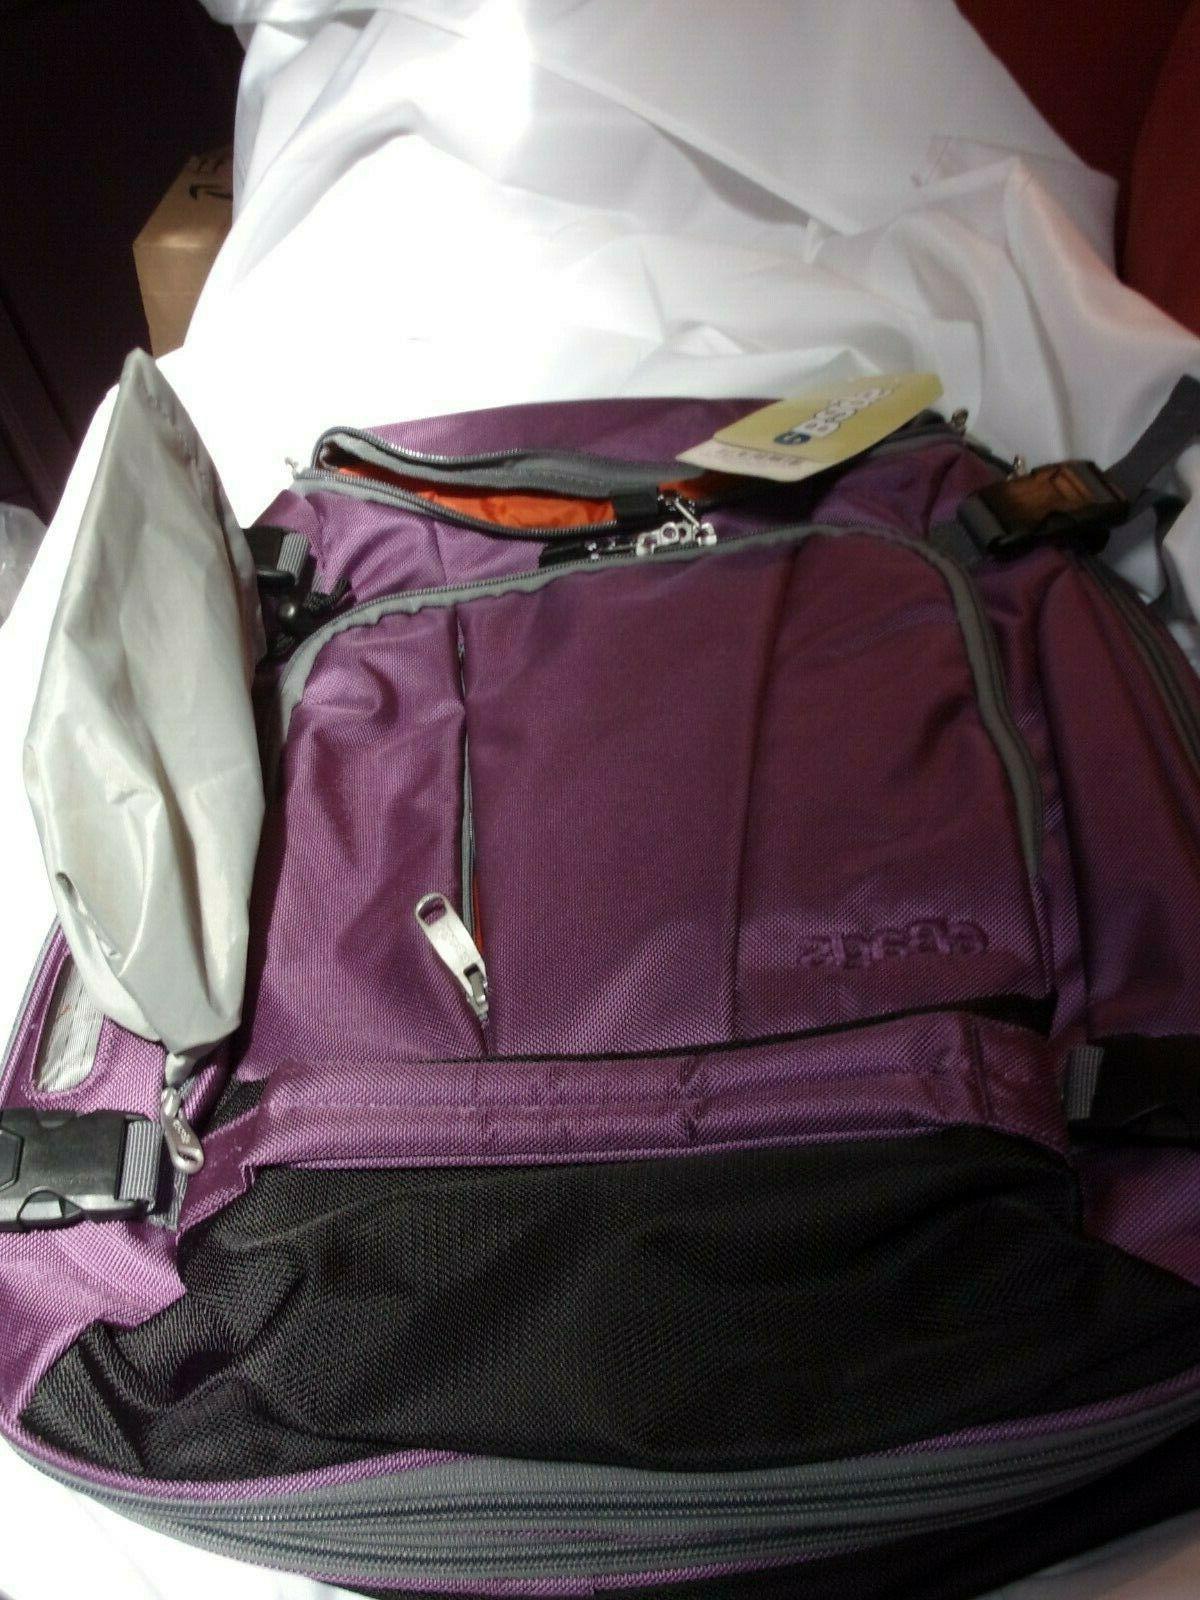 eBags travel laptop